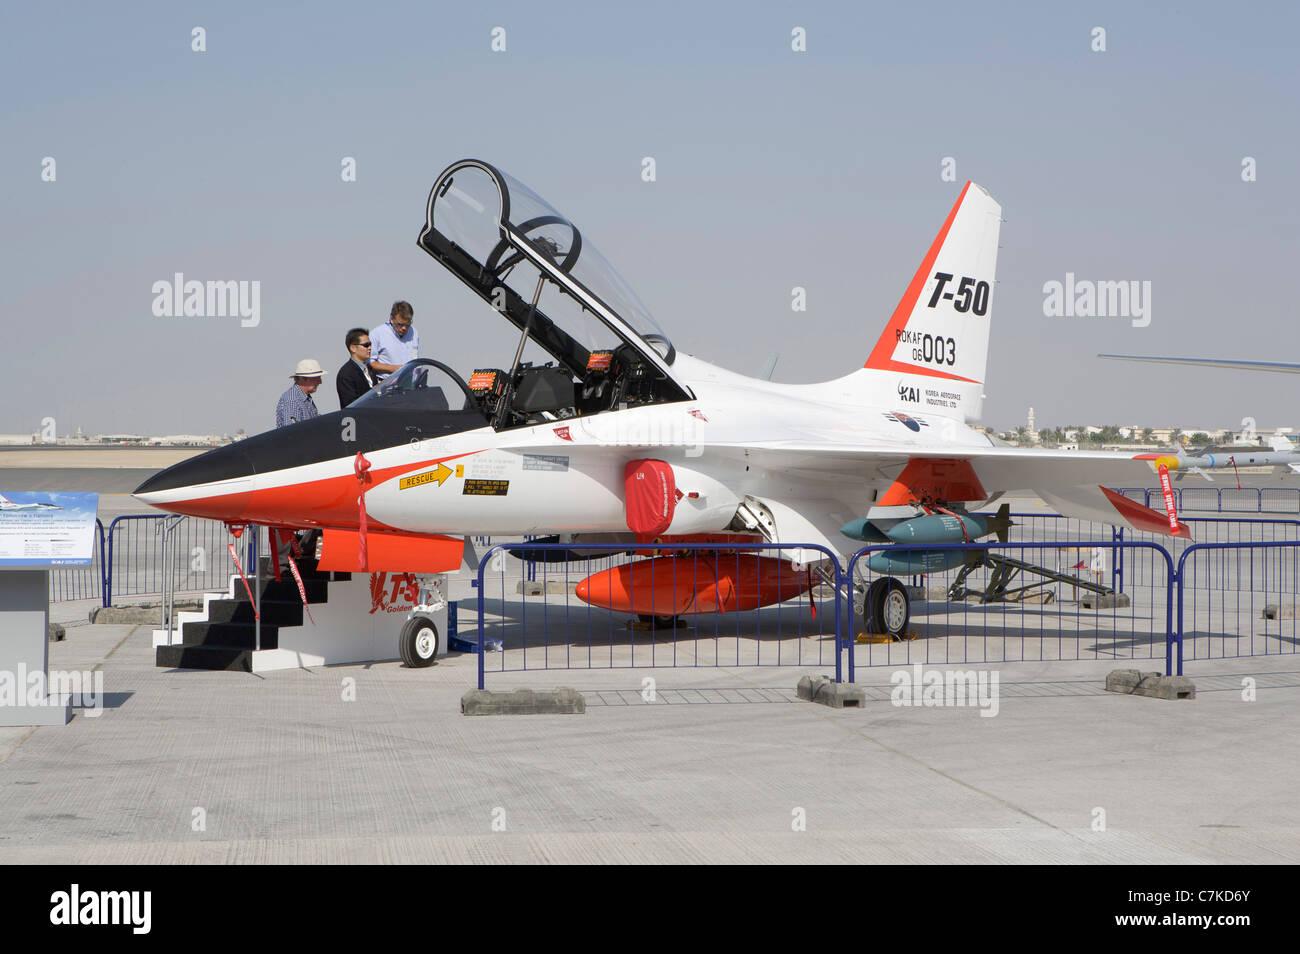 Dubai Air Show  T-50 Golden Eagle, supersonic advanced trainer and